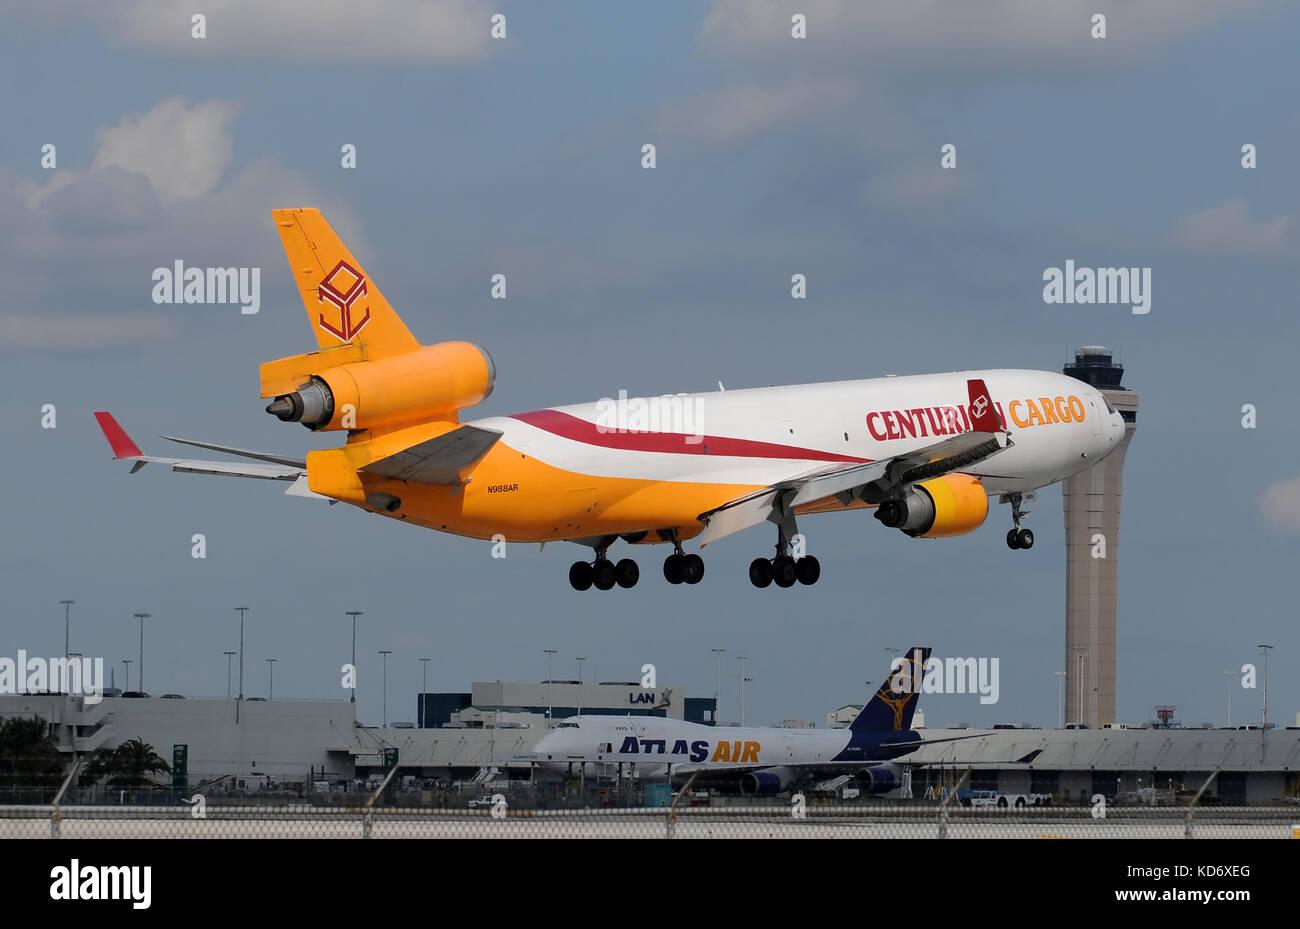 Miami, Florida - January 30, 2011: Heavy cargo jet from Centurion Air Cargo landing at Miami International. Miami - Stock Image